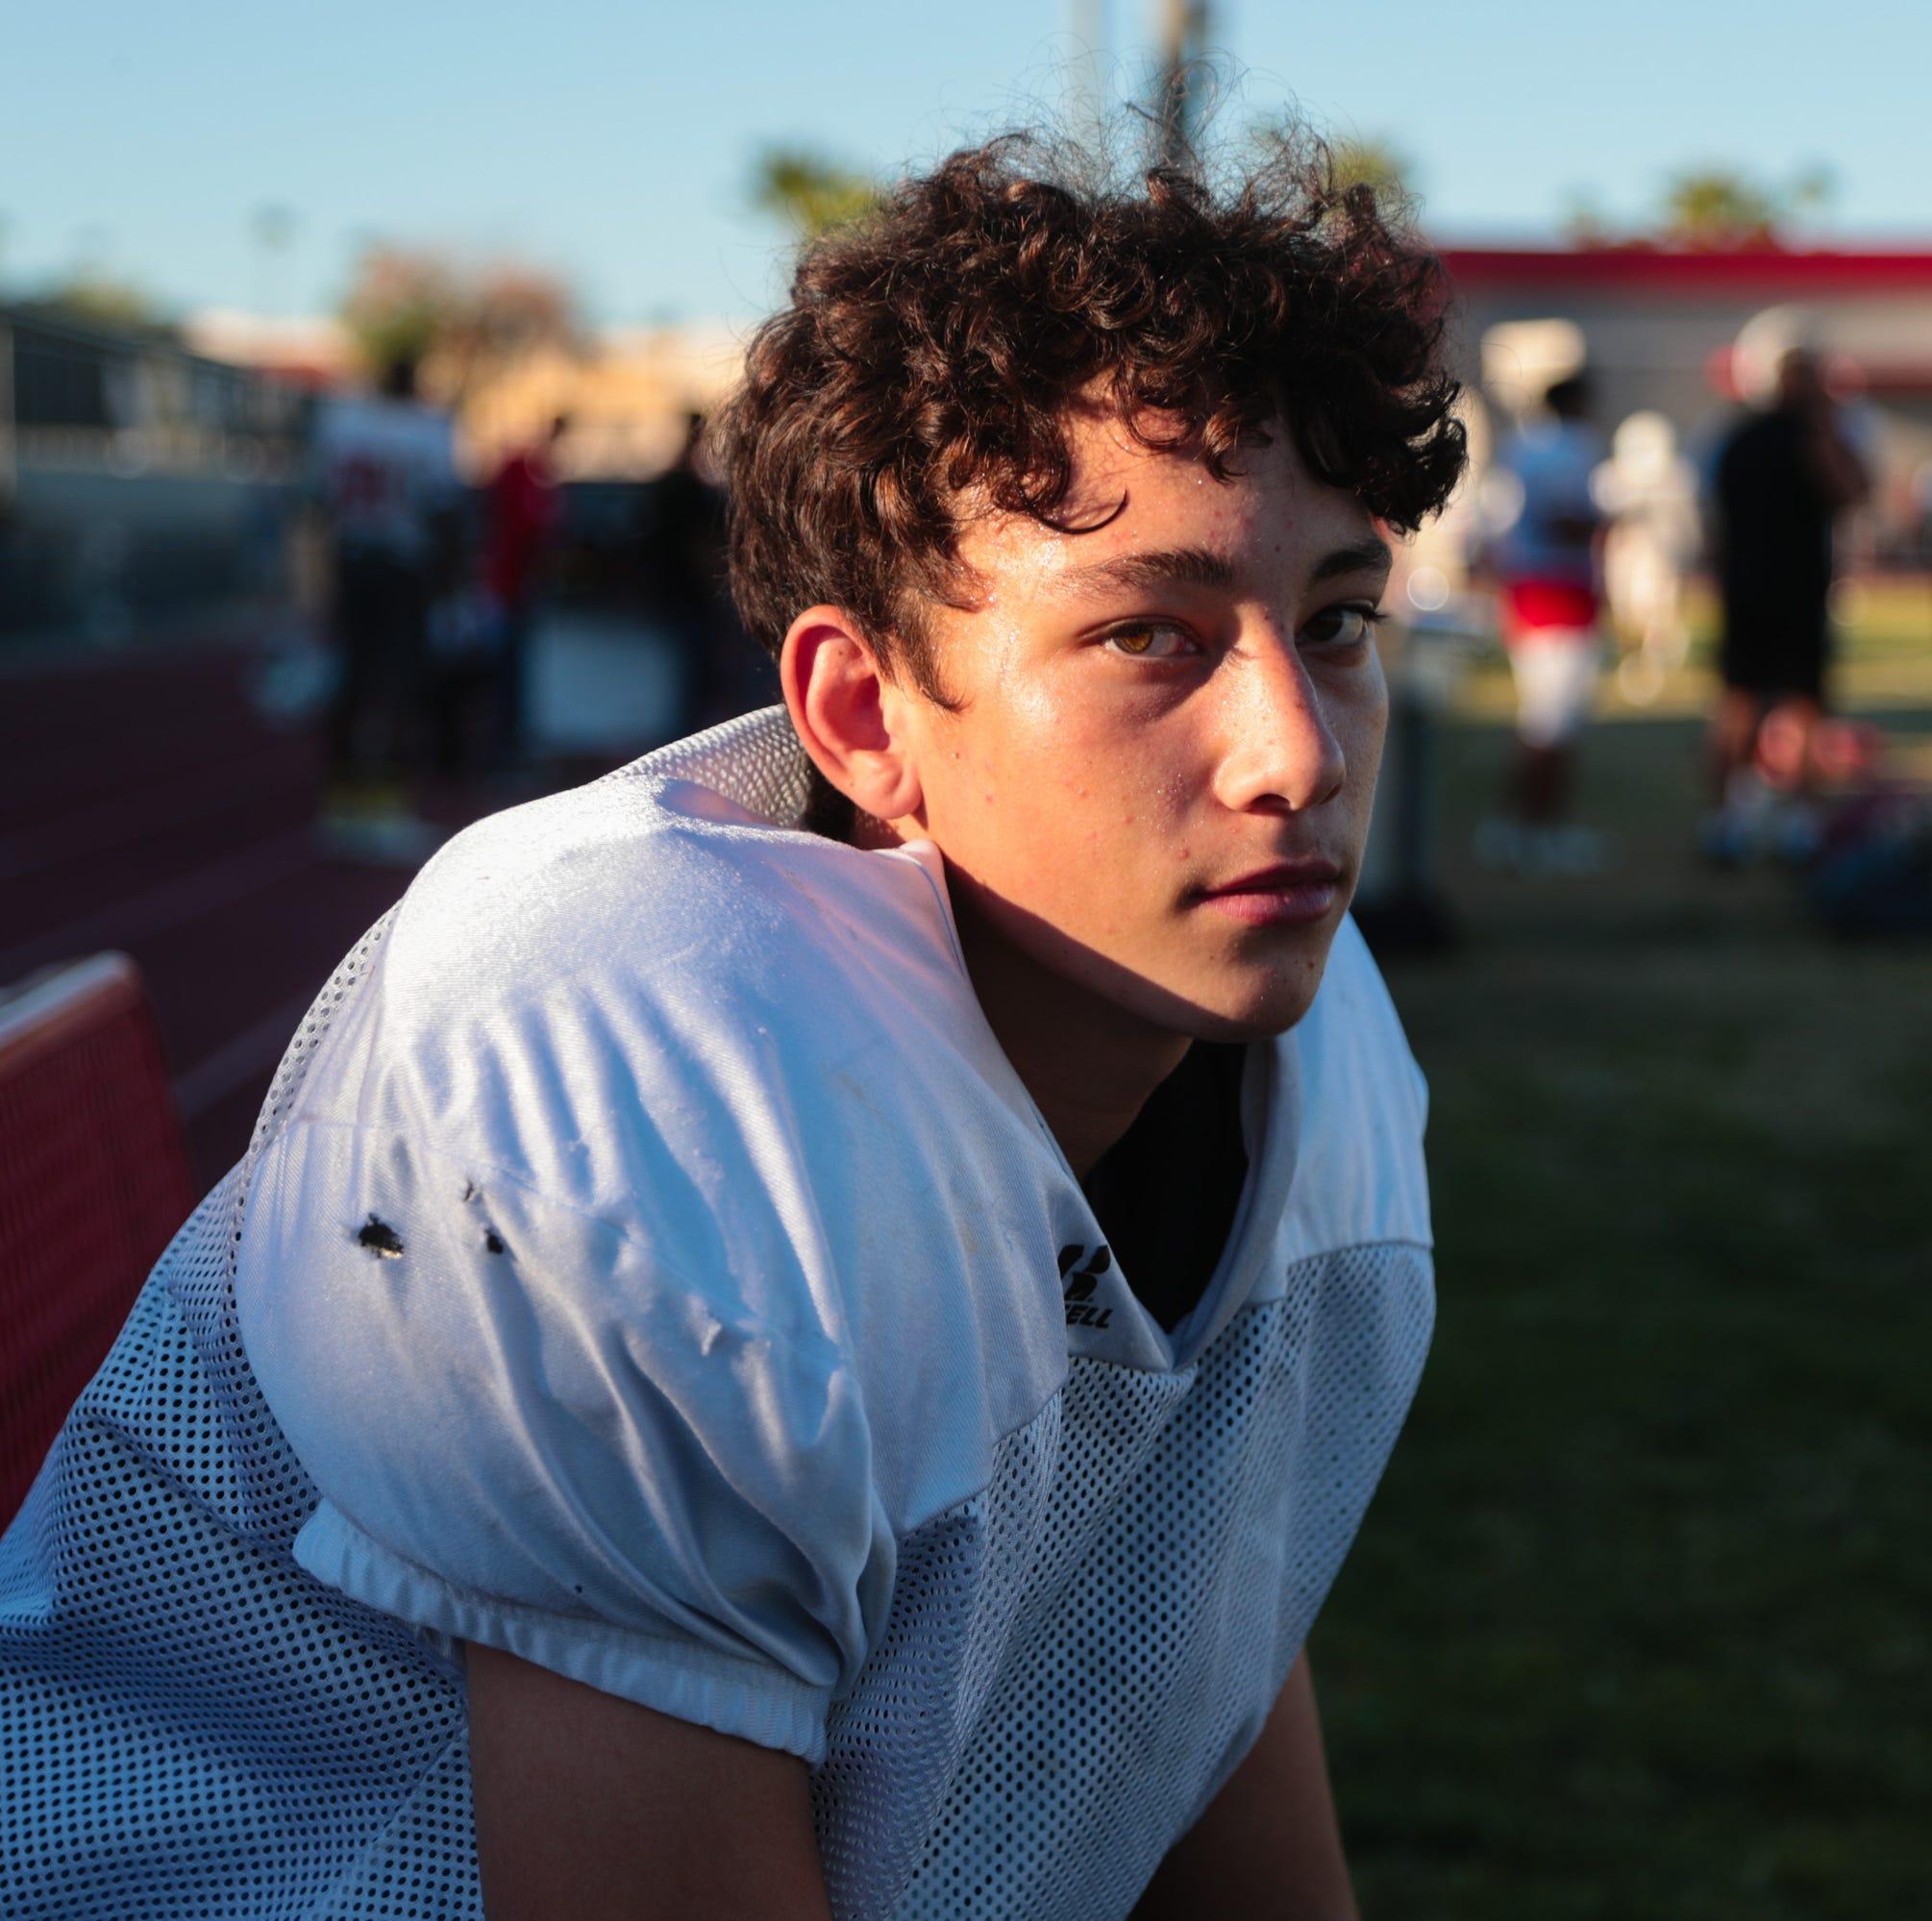 Freshman quarterback leads Palm Springs High School, just like his dad did 20 years ago